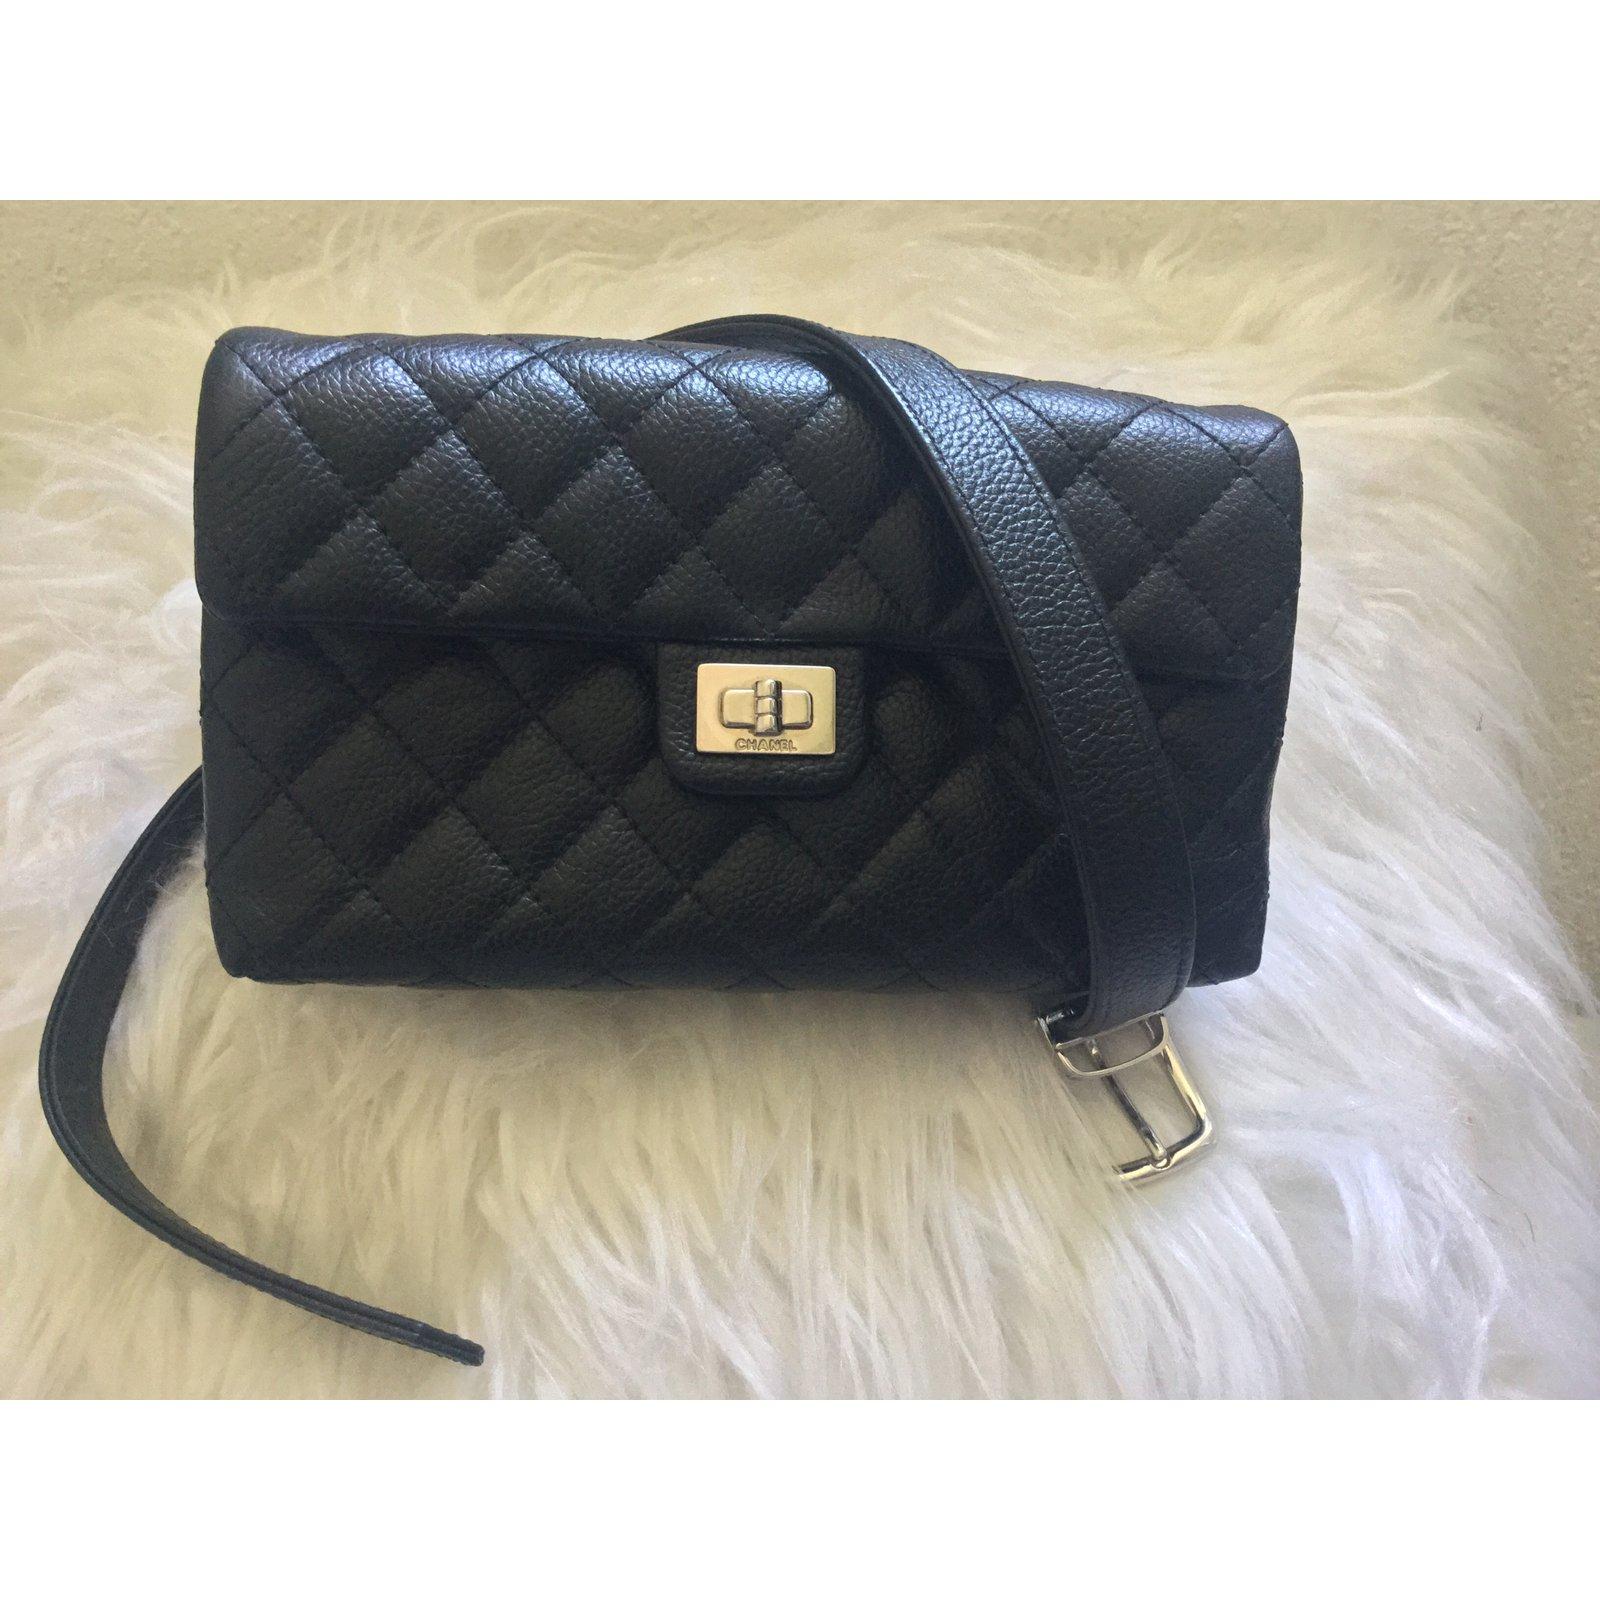 3fda3c1b175a7e Chanel belt bag Clutch bags Leather Black ref.74747 - Joli Closet